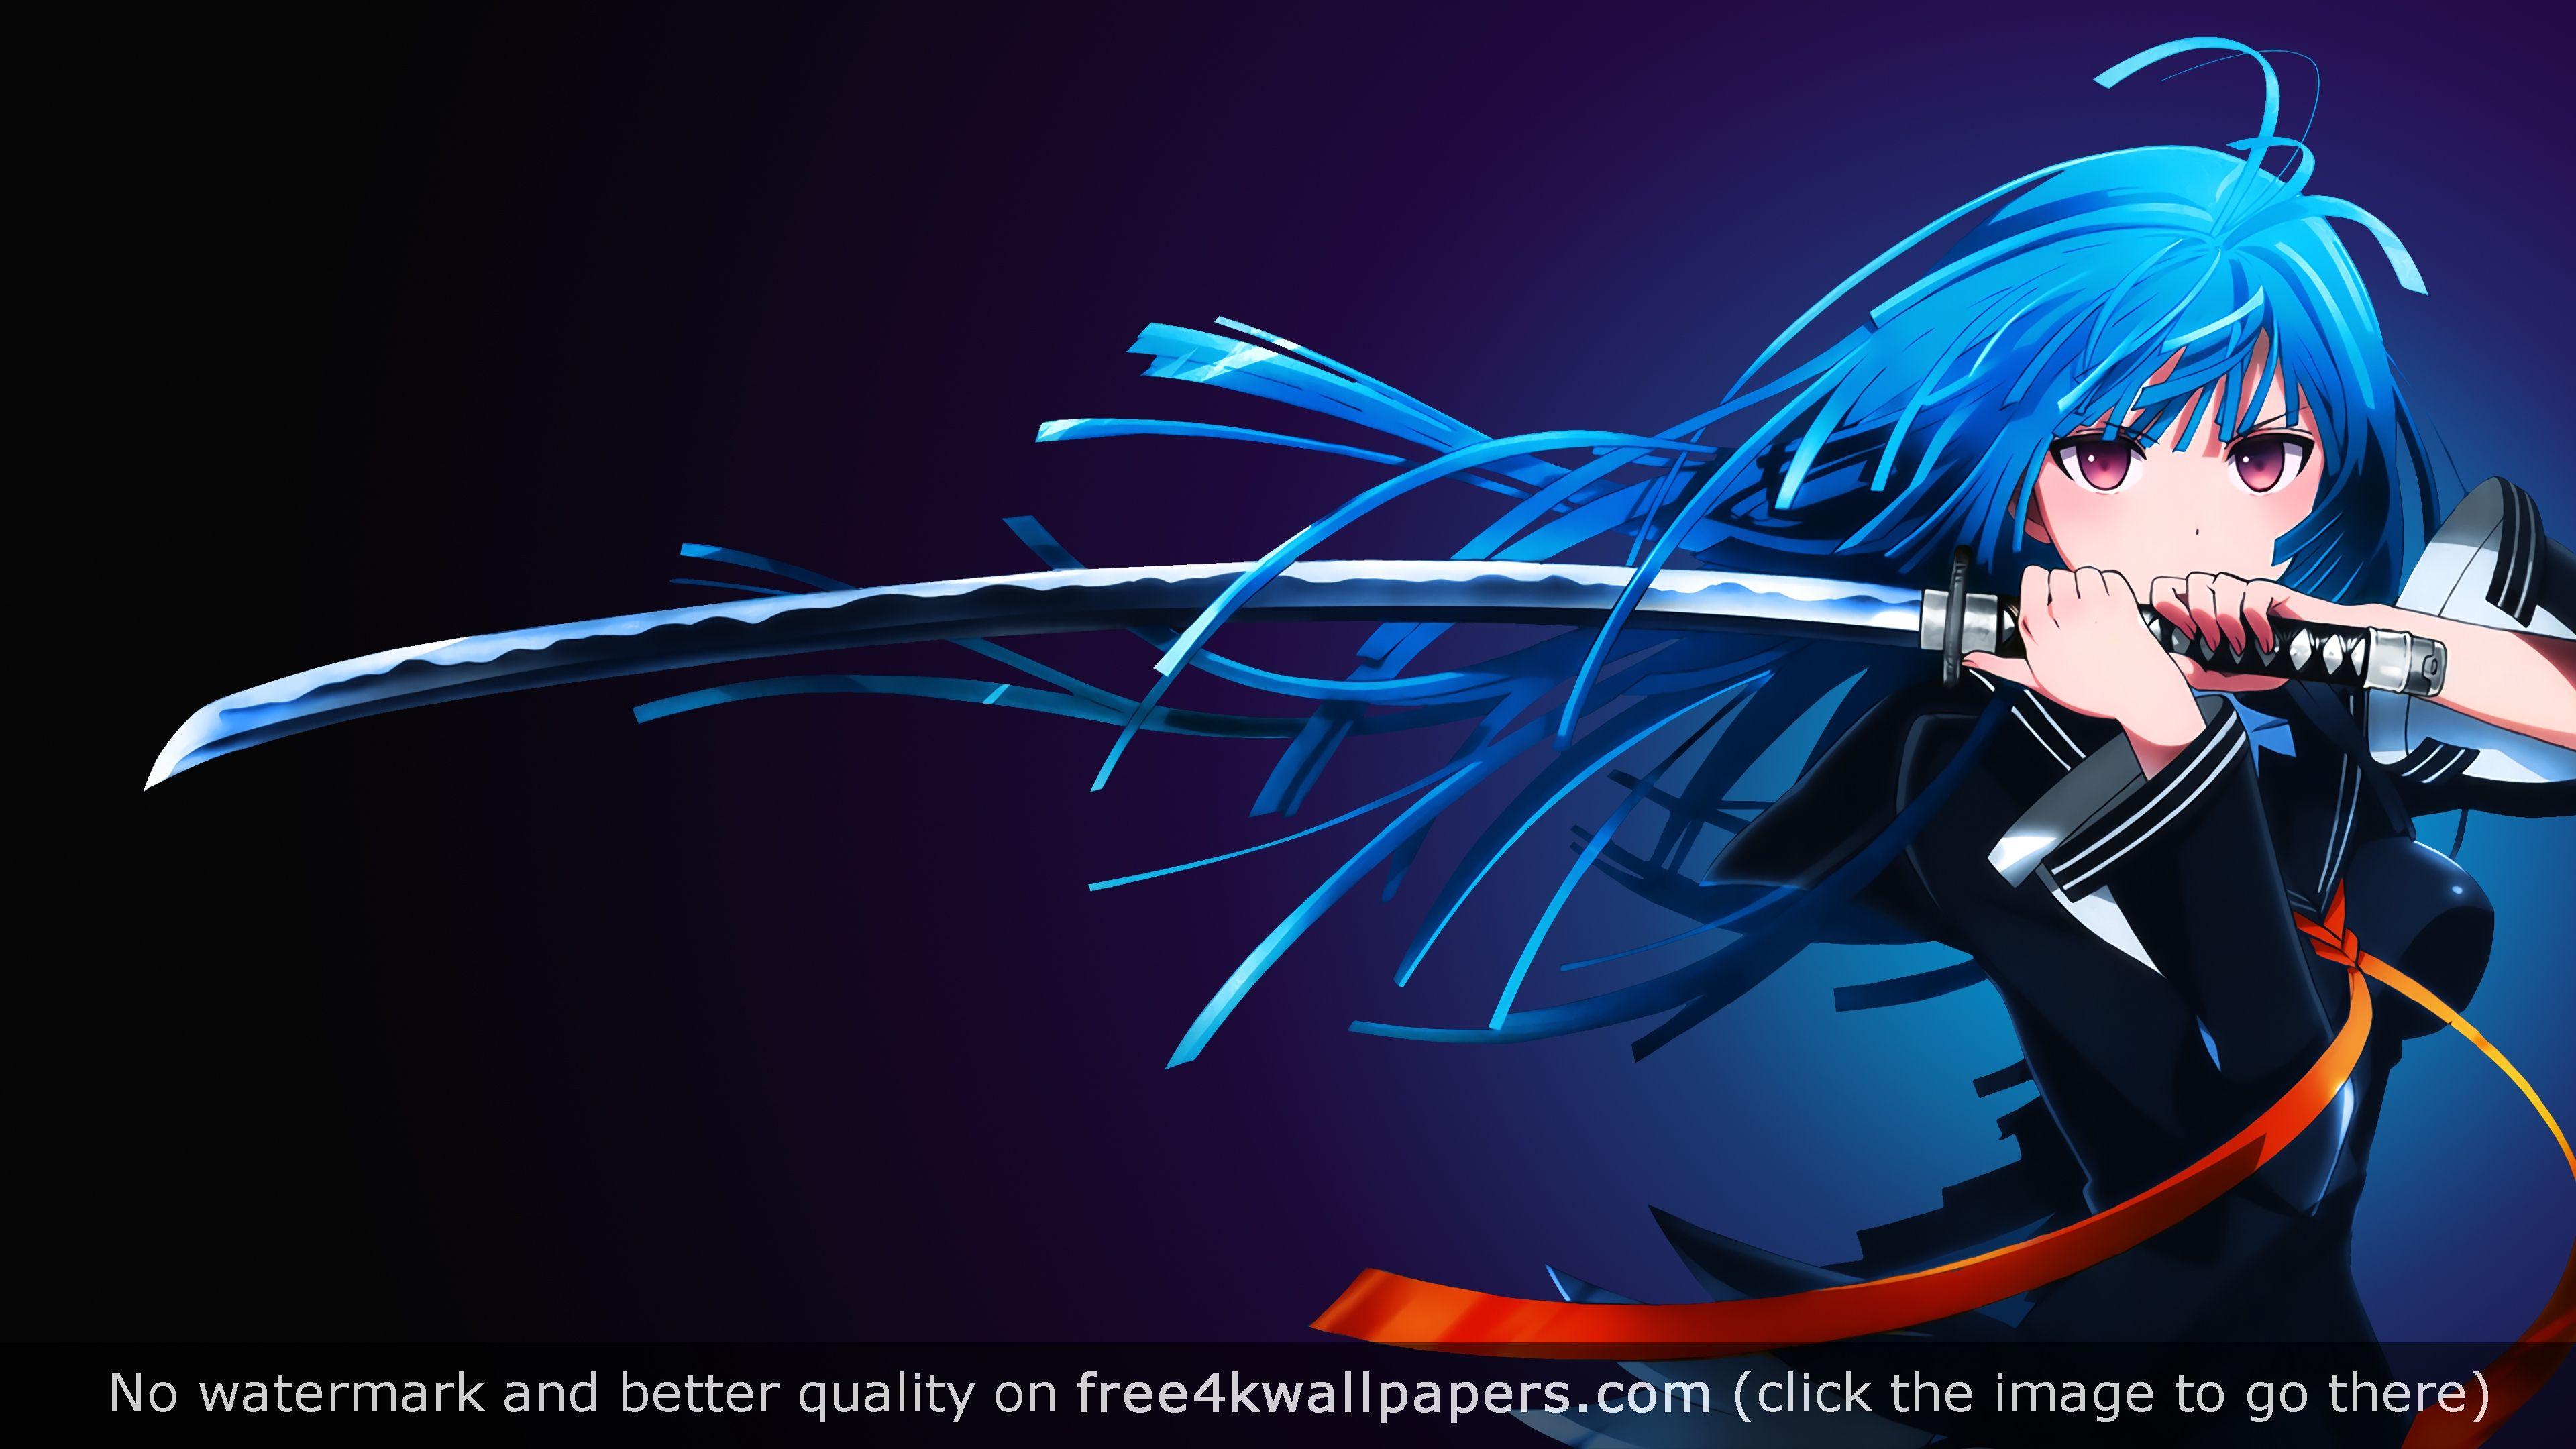 Kisara Tendo 4k Wallpaper Anime Wallpaper Download Hd Anime Wallpapers Cute Anime Wallpaper